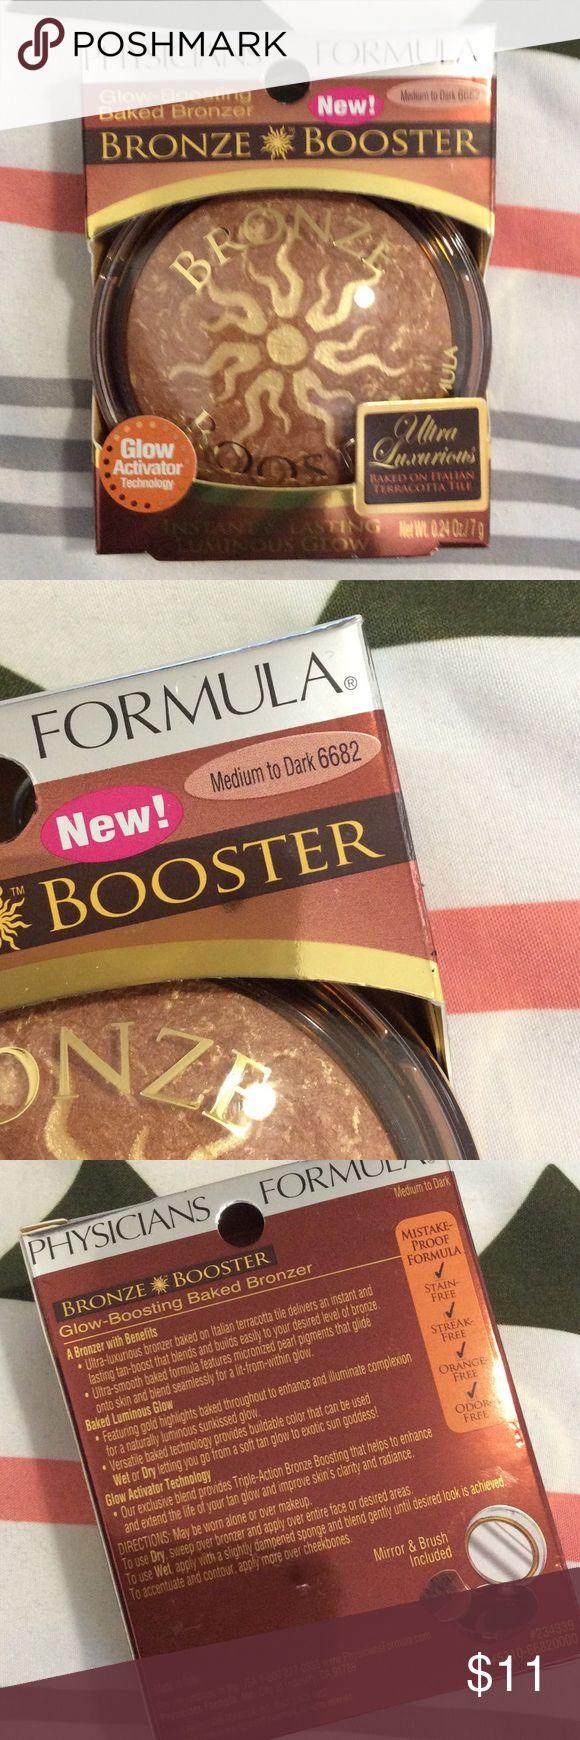 Bronze booster Physicians formula bronze booster in medium to dark 6682 with glow activator technology Physicians Formula Makeup Bronzer